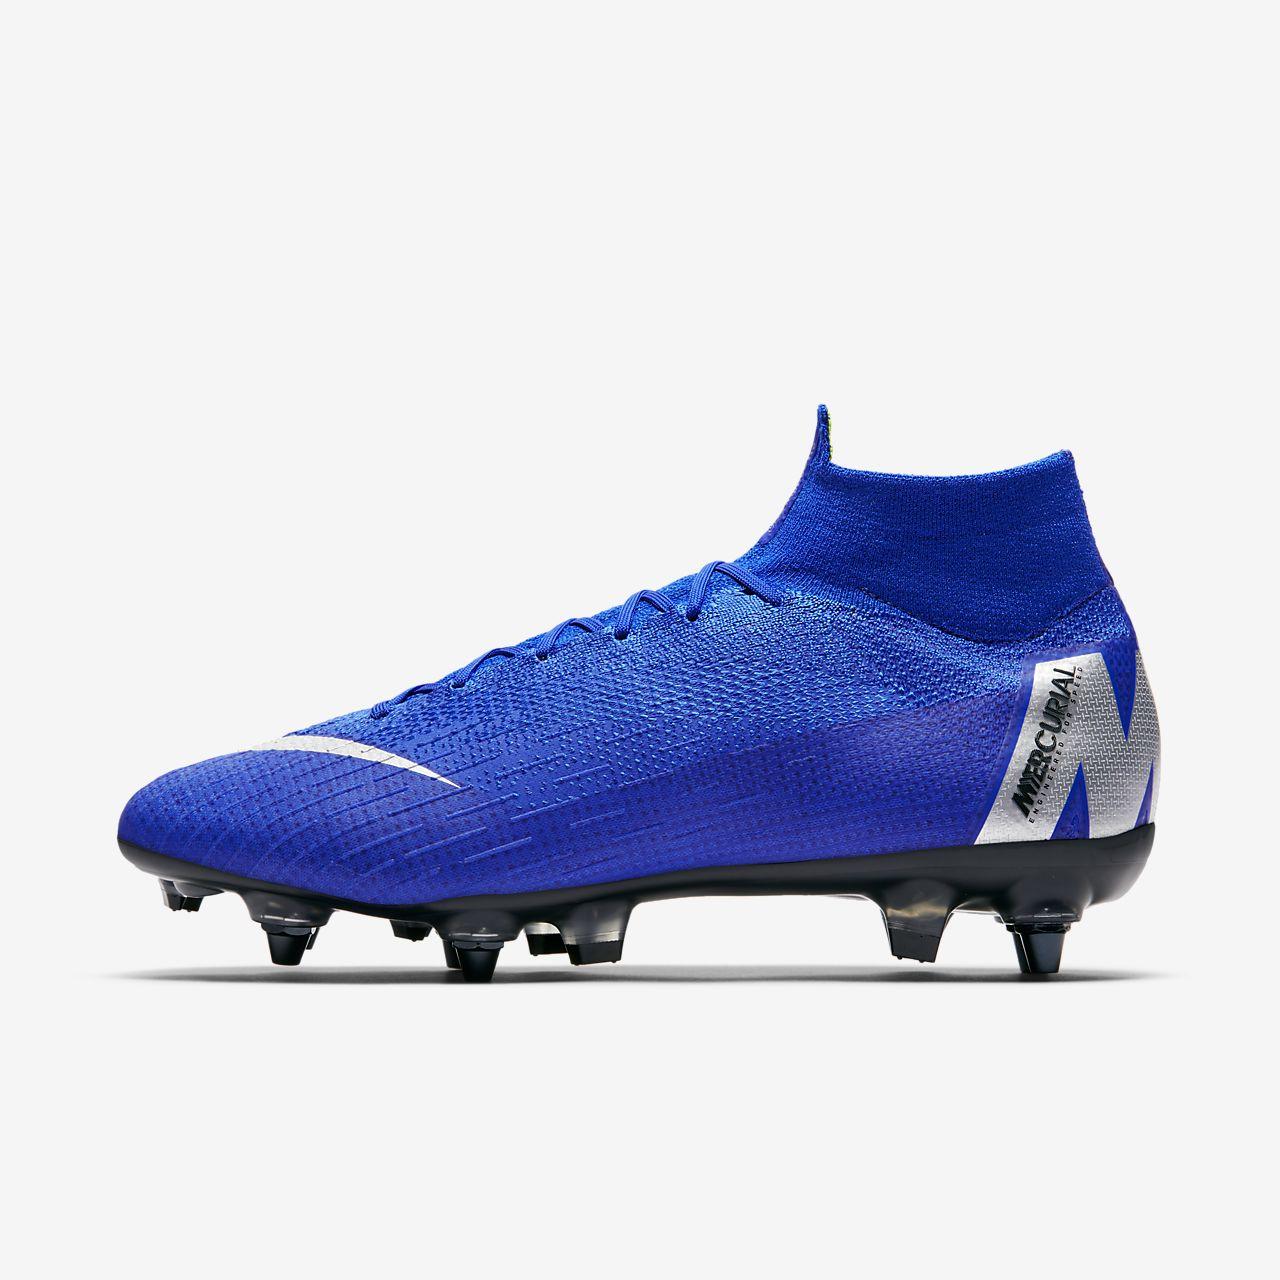 Calzado de fútbol para terreno blando Nike Mercurial Superfly 360 Elite SG-PRO Anti-Clog